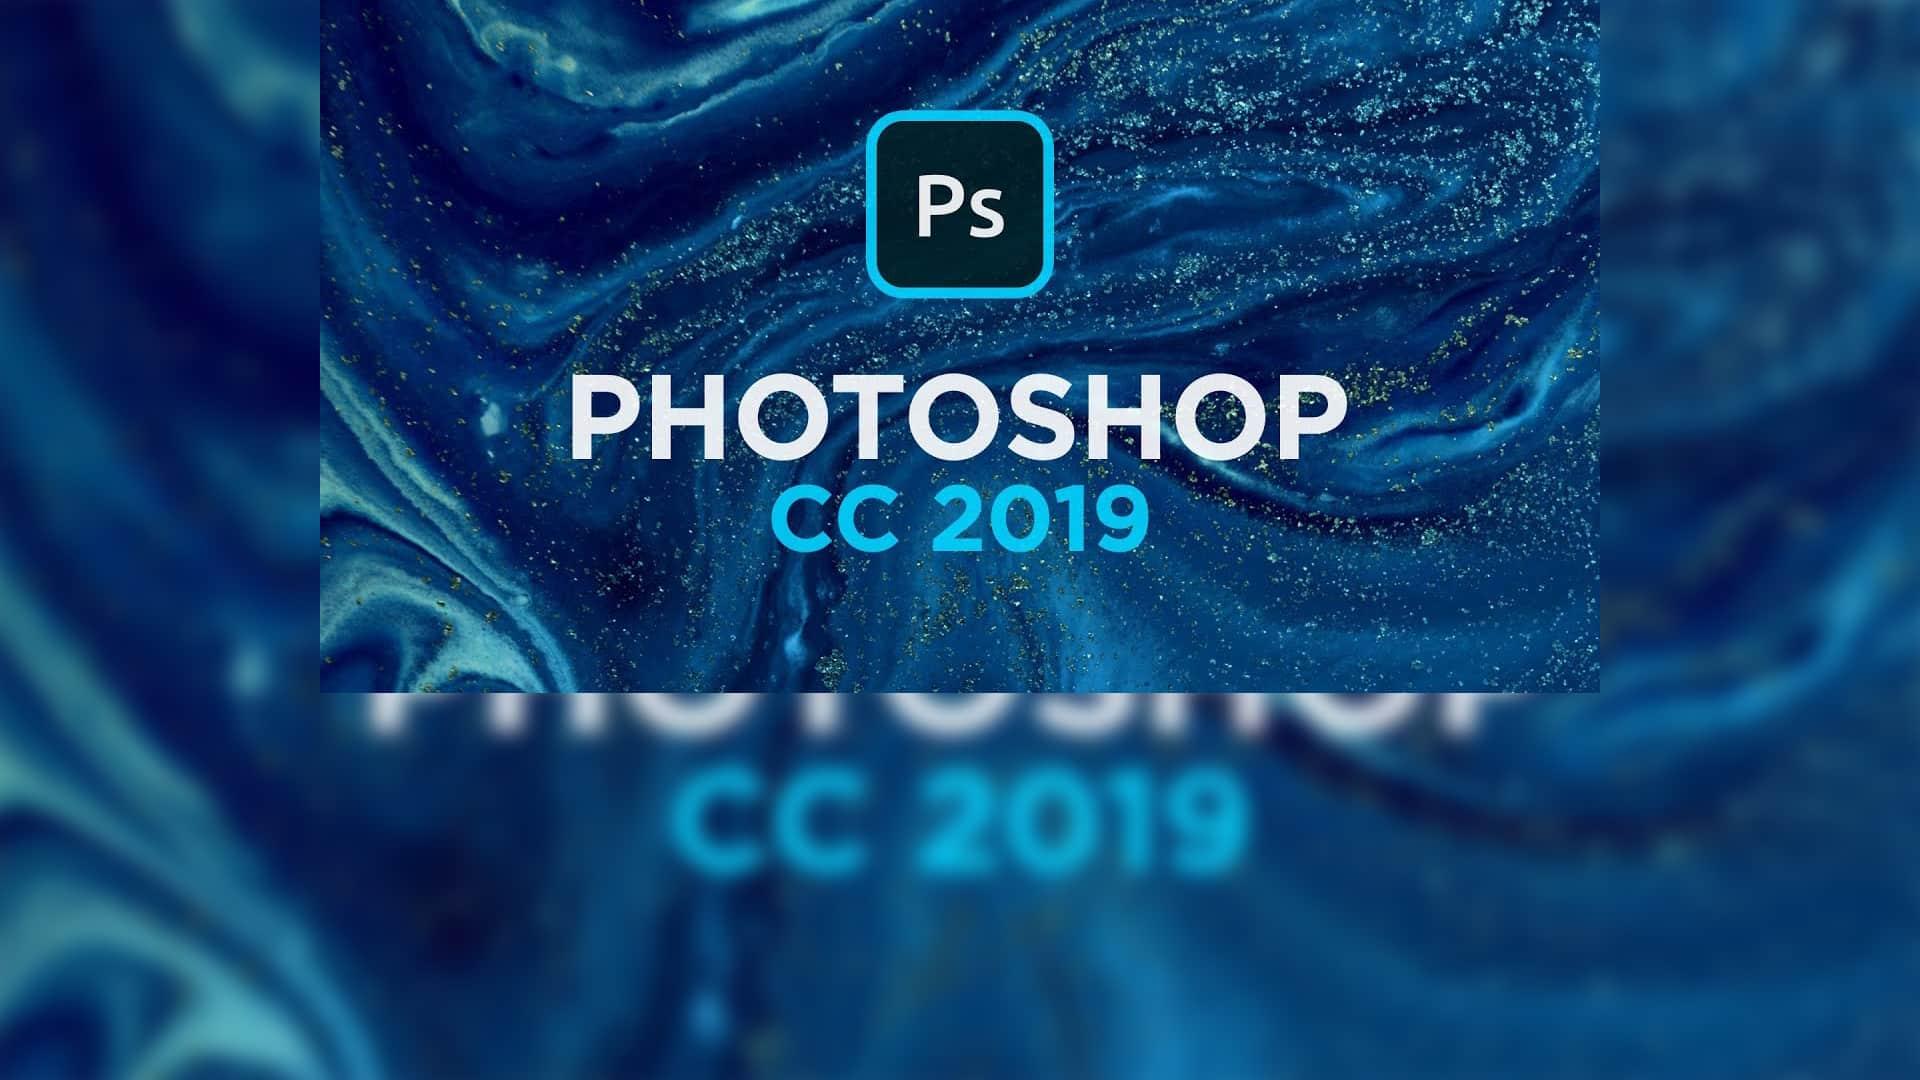 Photoshop 2019使用旧版自由变换方法(改为需按Shift)